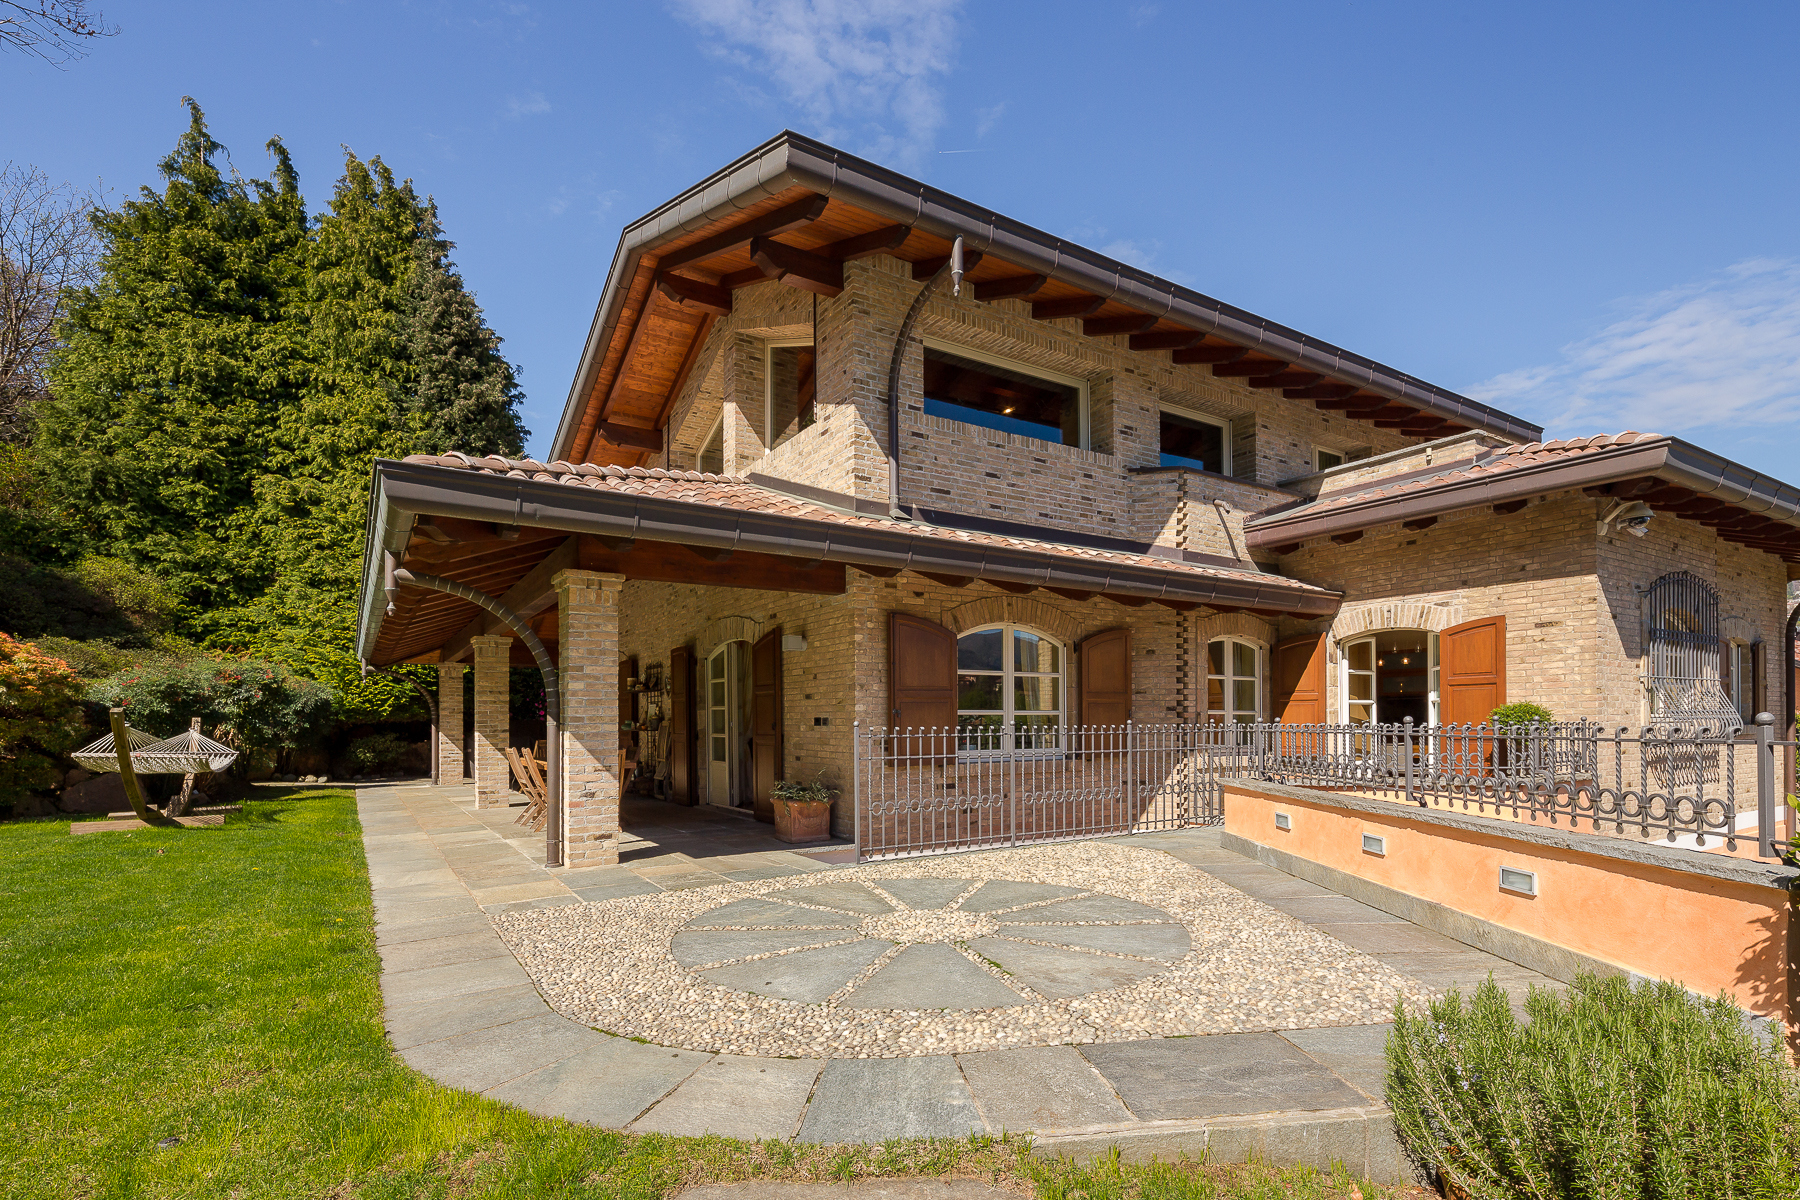 Villa in Vendita a Varese: 5 locali, 470 mq - Foto 5